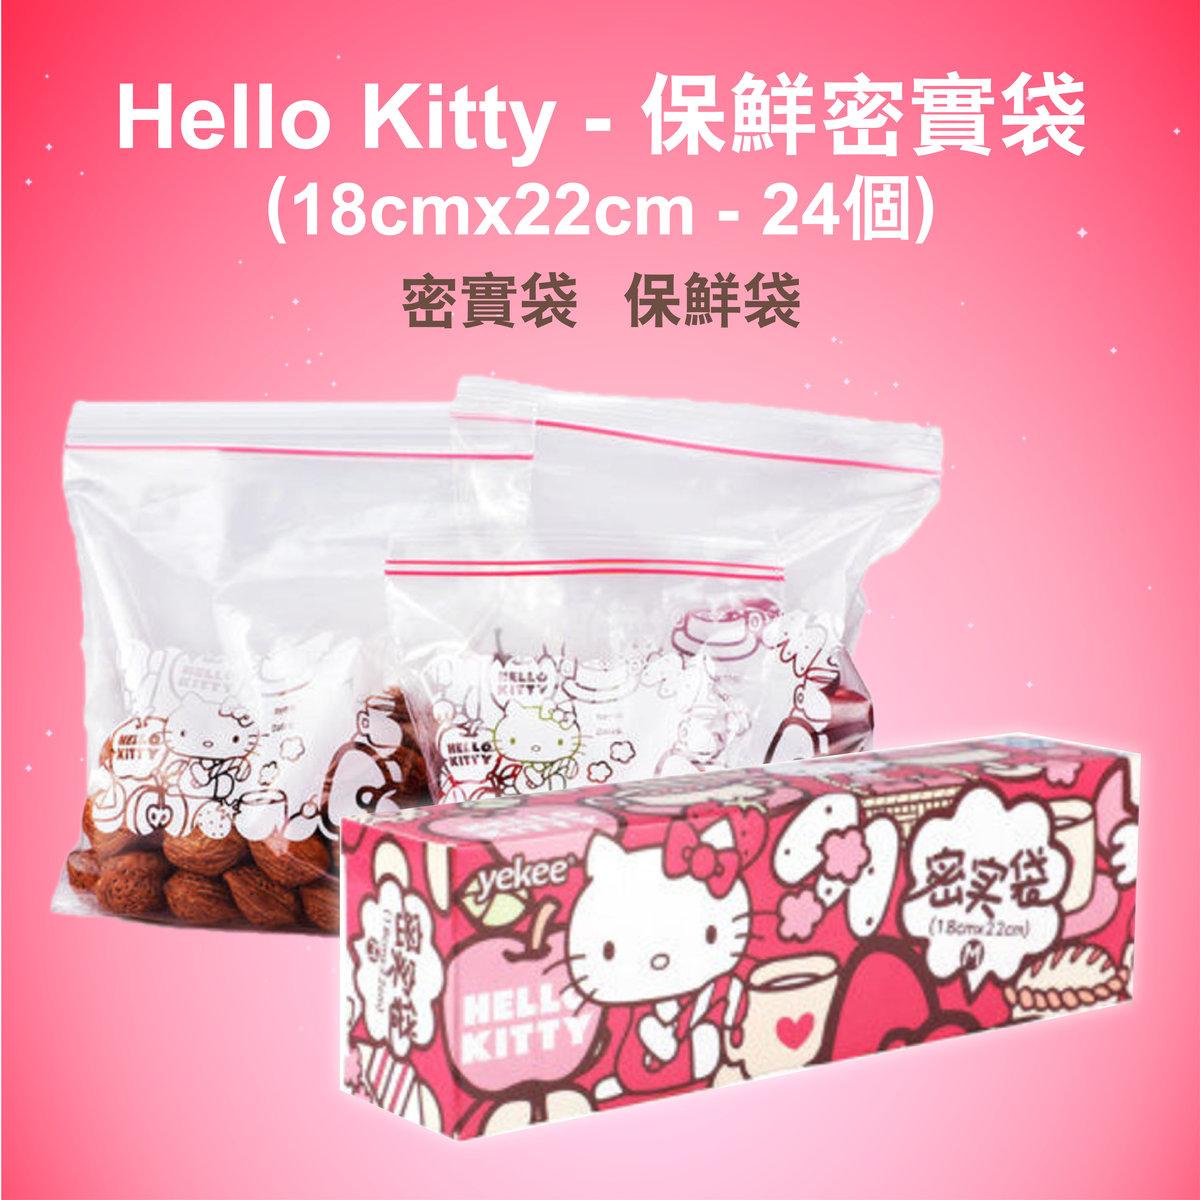 Hello Kitty - 保鮮密實袋 (18cm x 22cm - 24個) 密實袋 保鮮袋